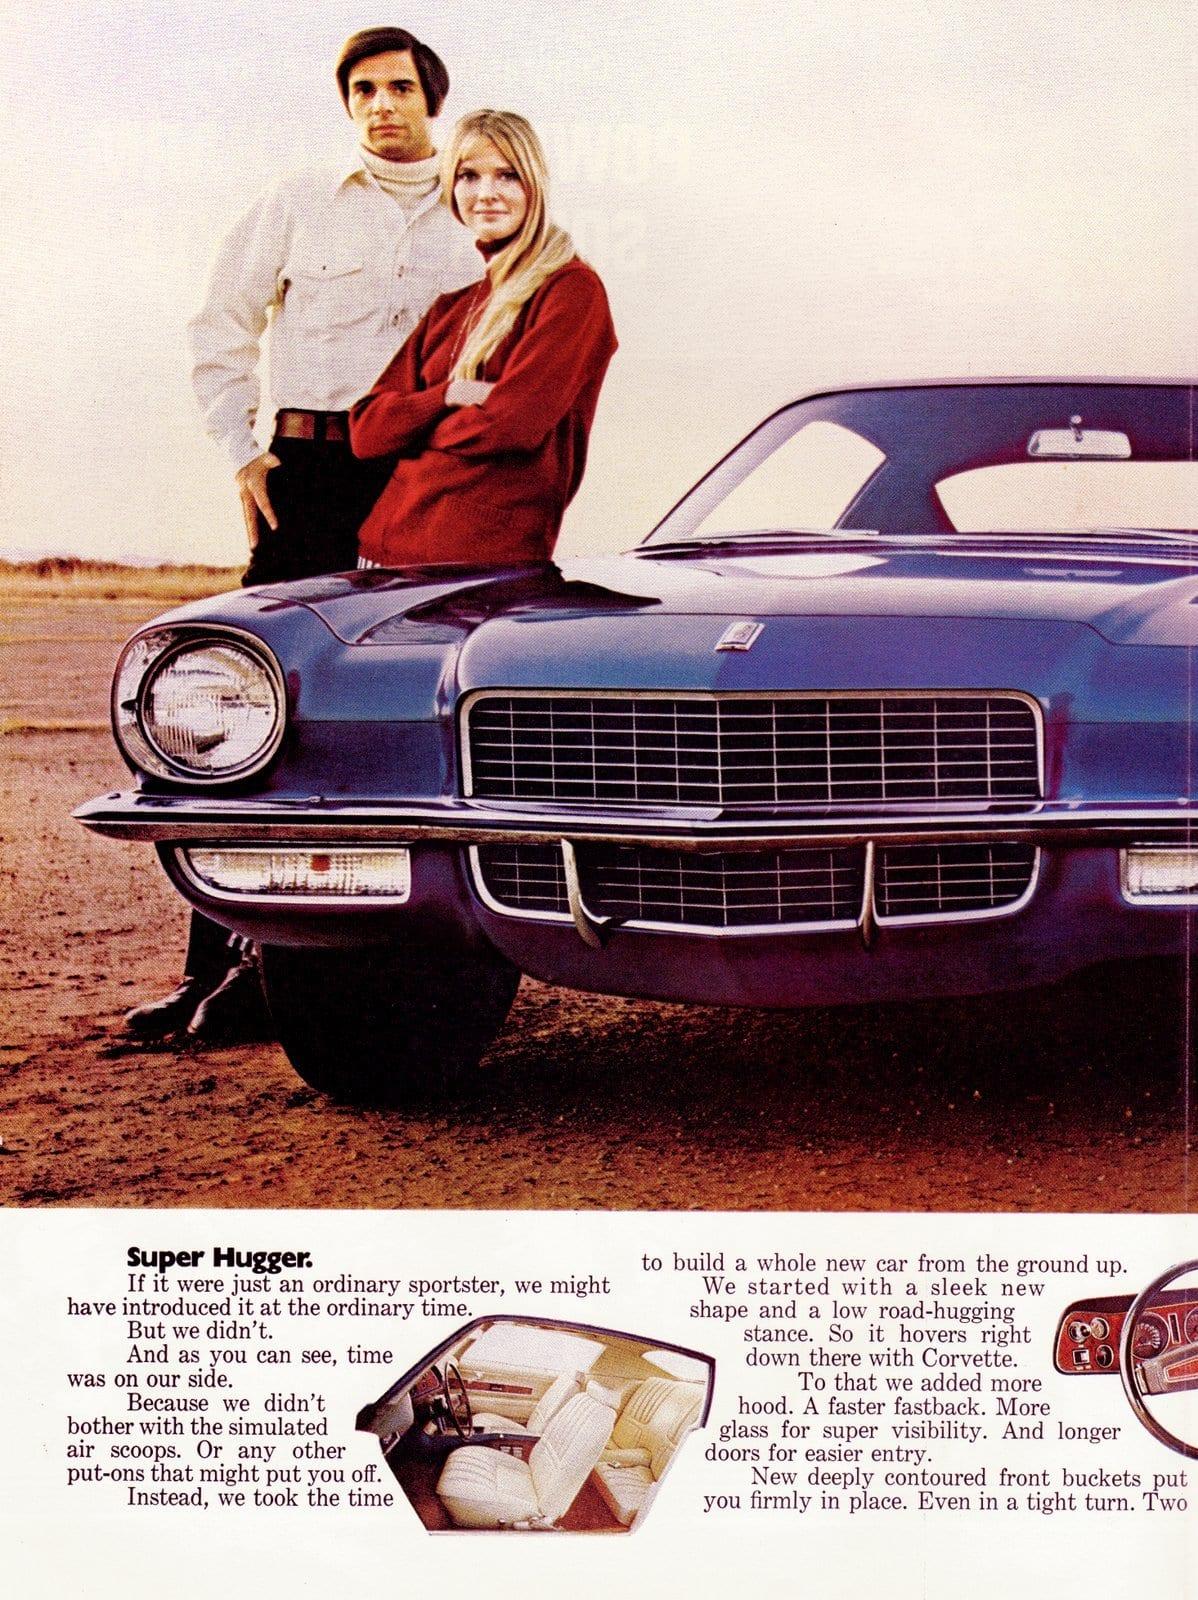 1970 Camaro Super Hugger - Classic Chevy cars (1)